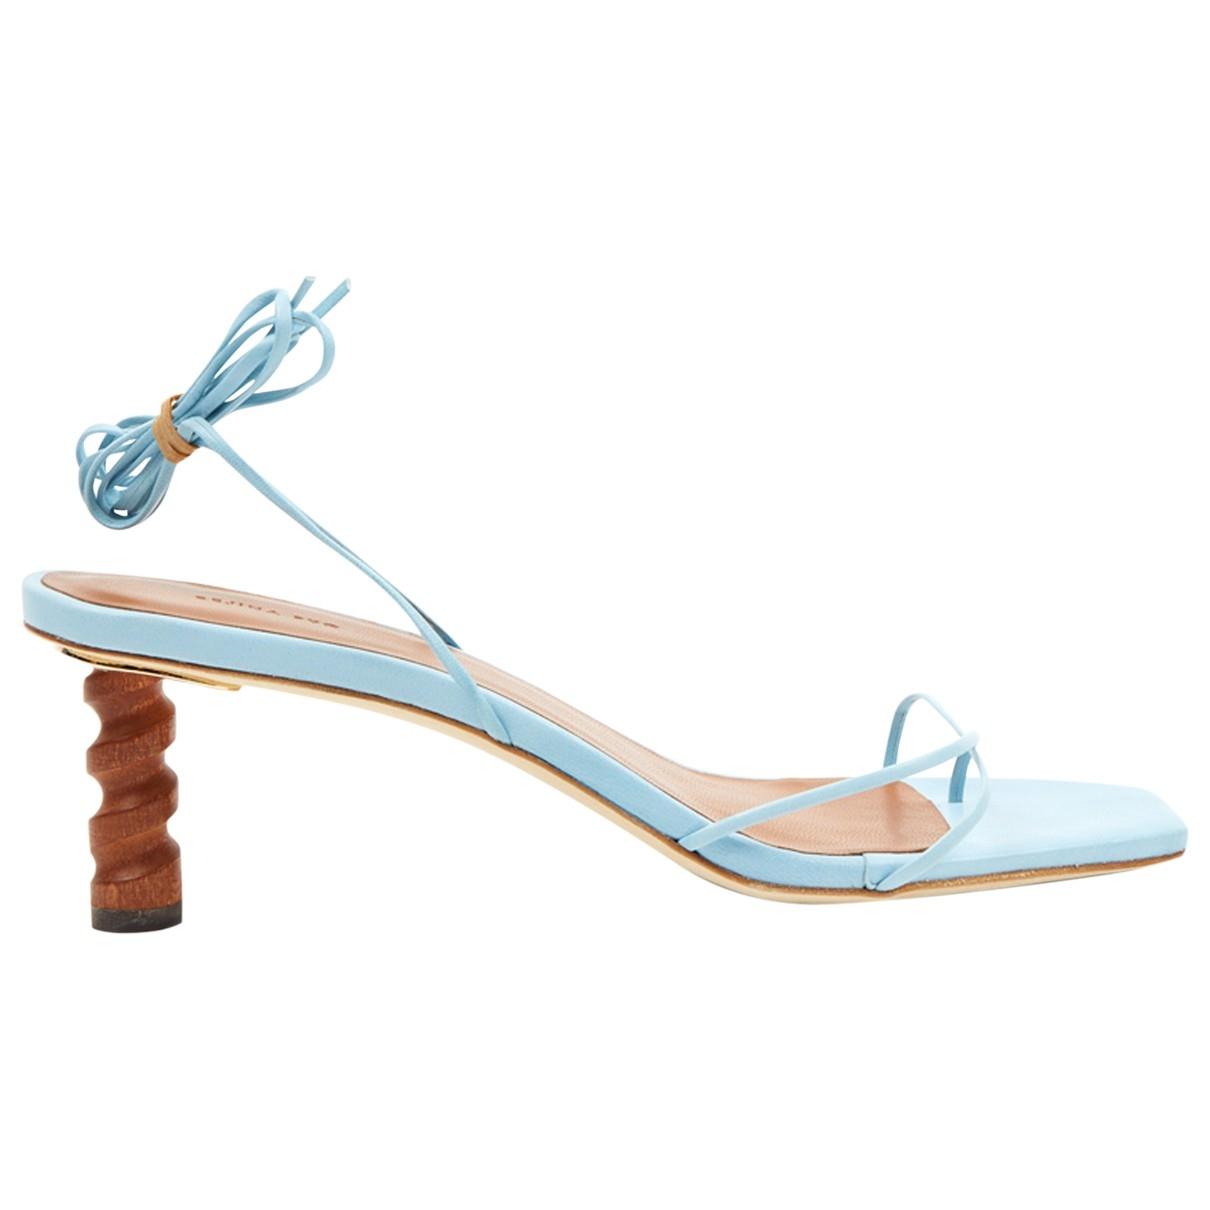 Rejina Pyo X Vestiaire Collective Leather sandals